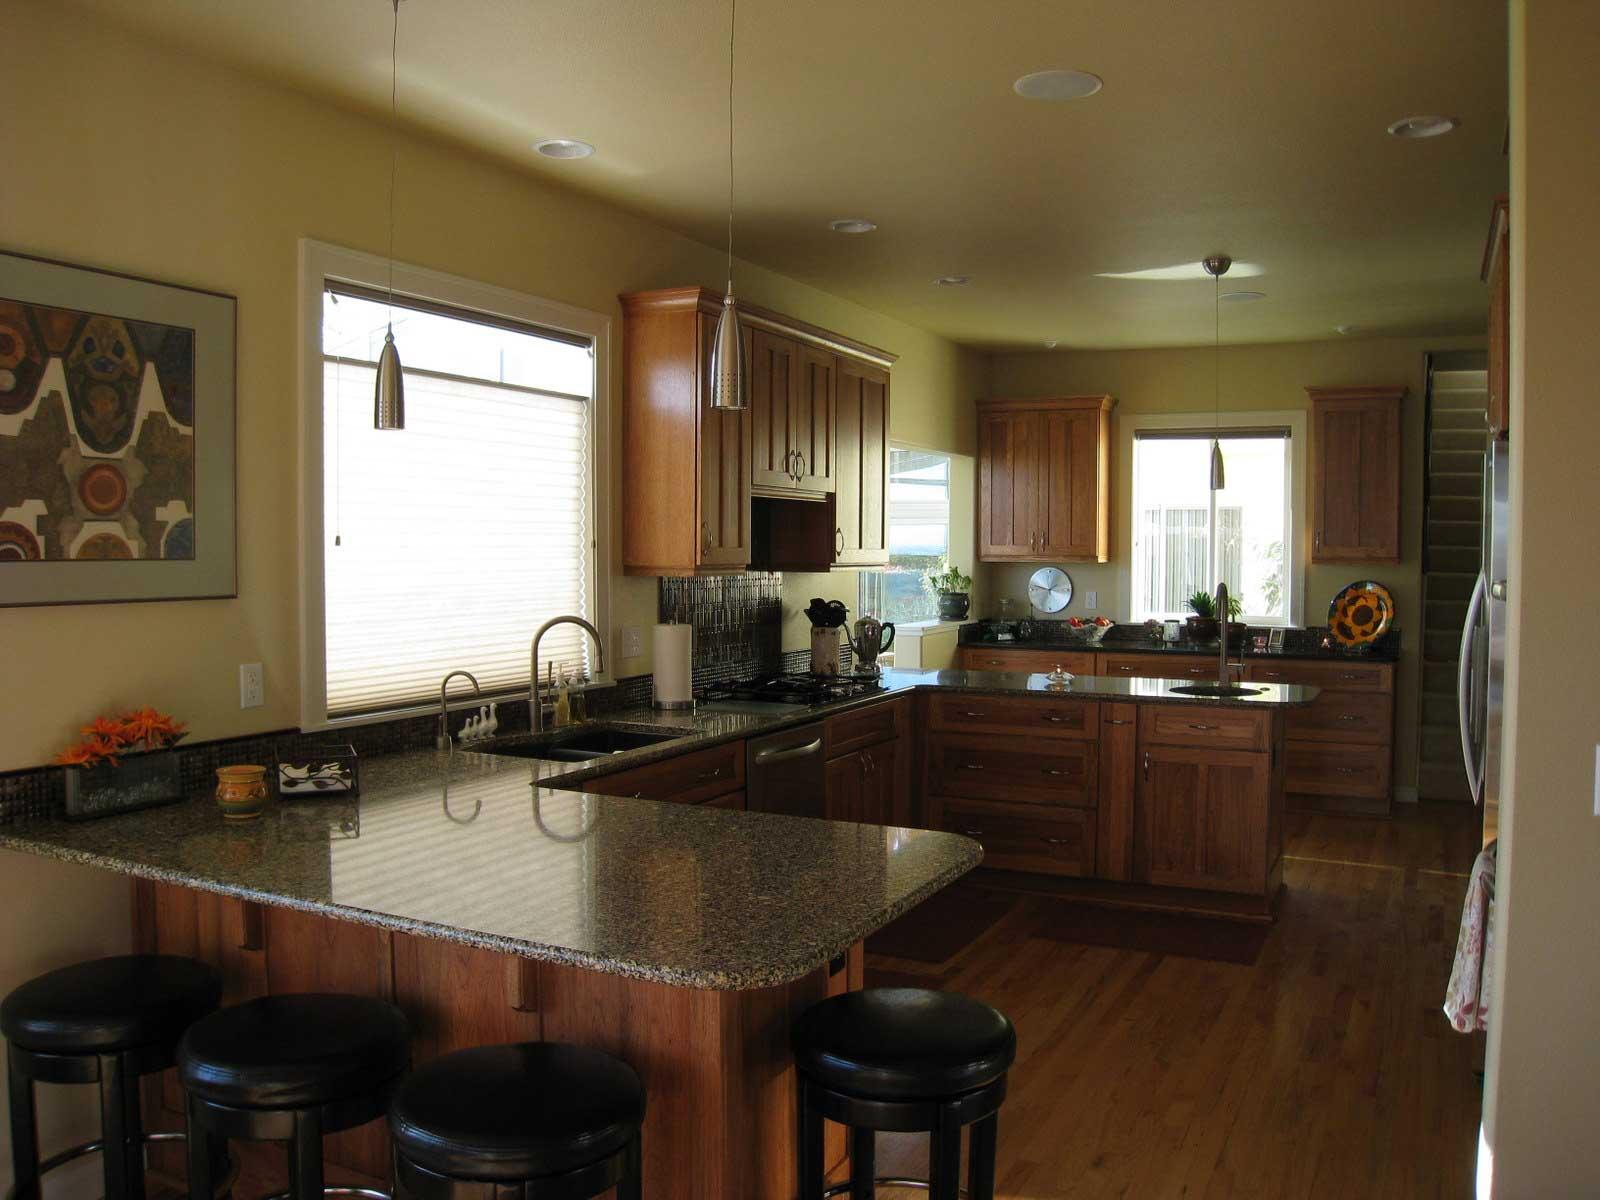 Kitchen Remodeling 1600 x 1200 · 115 kB · jpeg